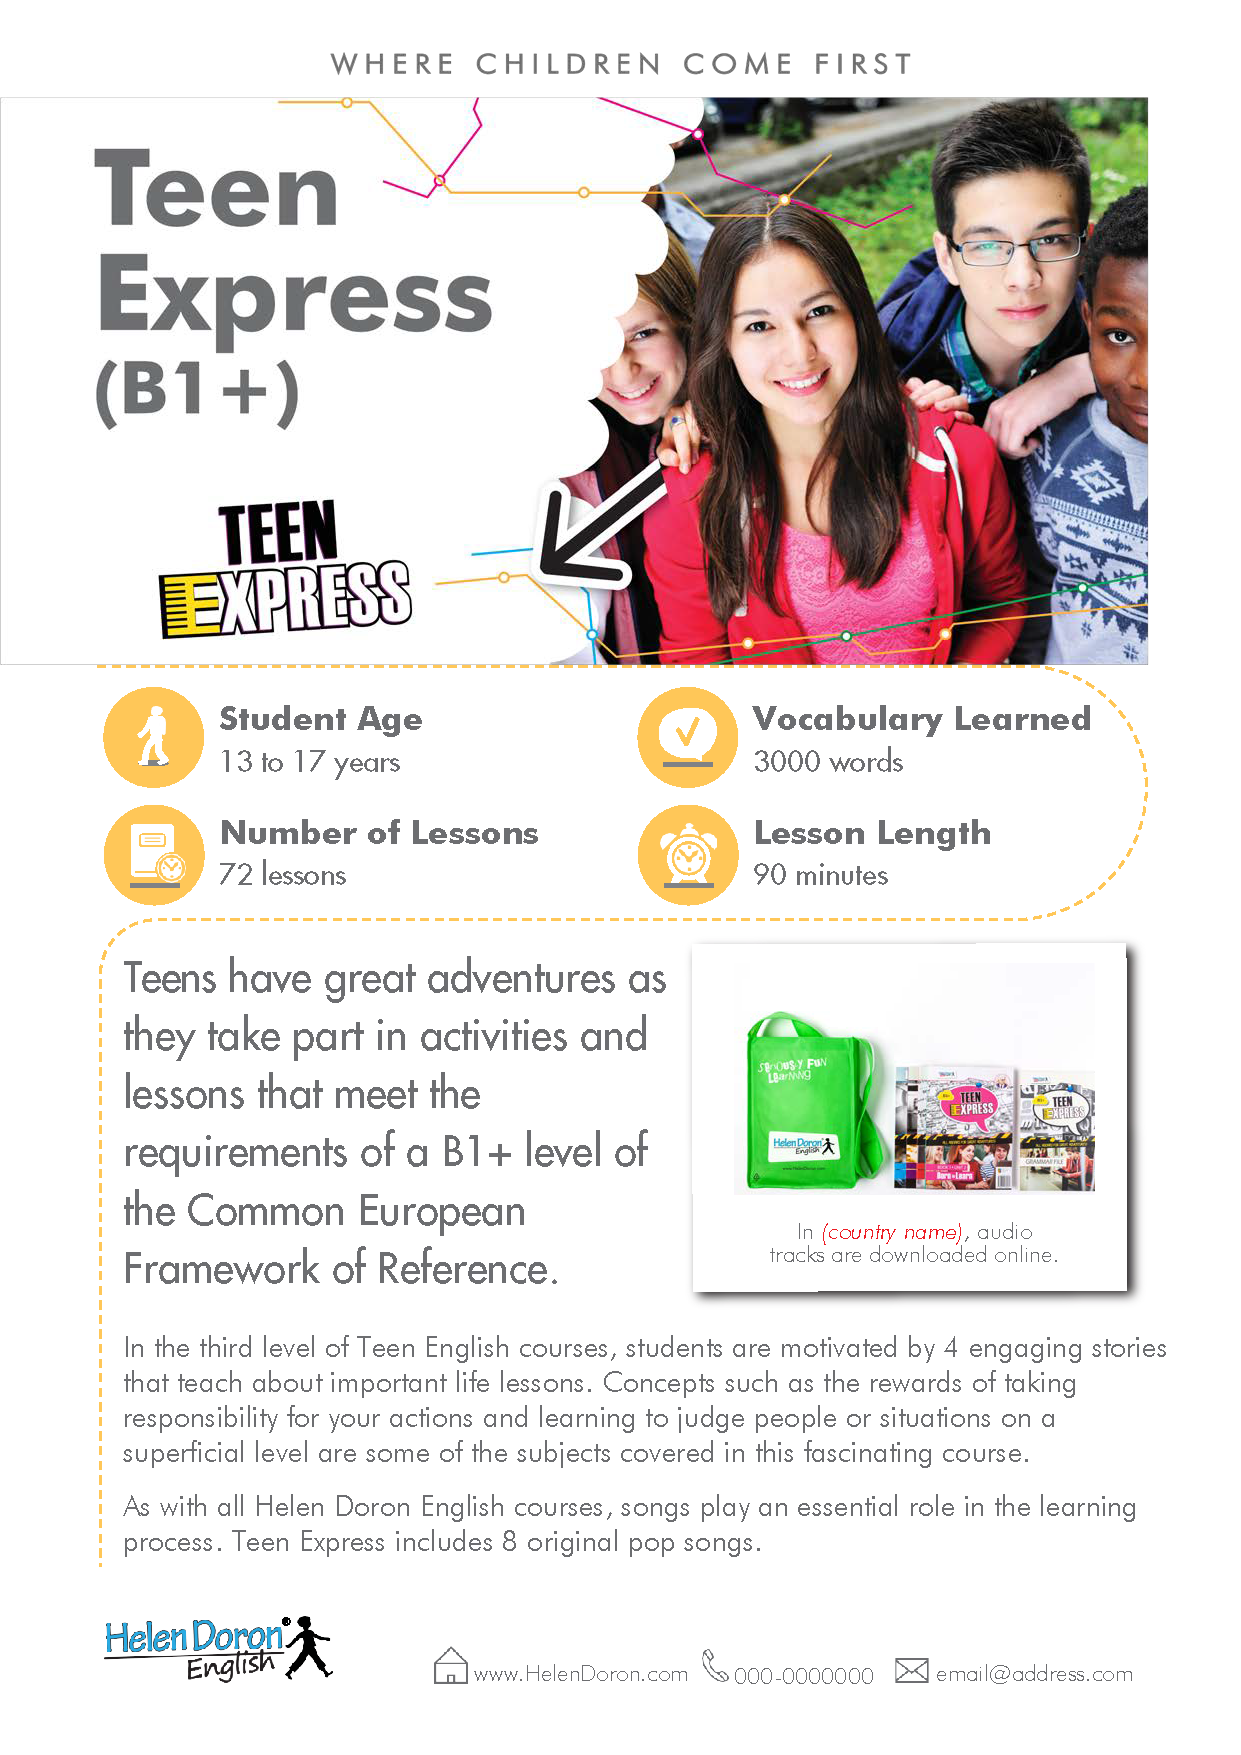 Parsisiųsti - Teen Express (B1+)